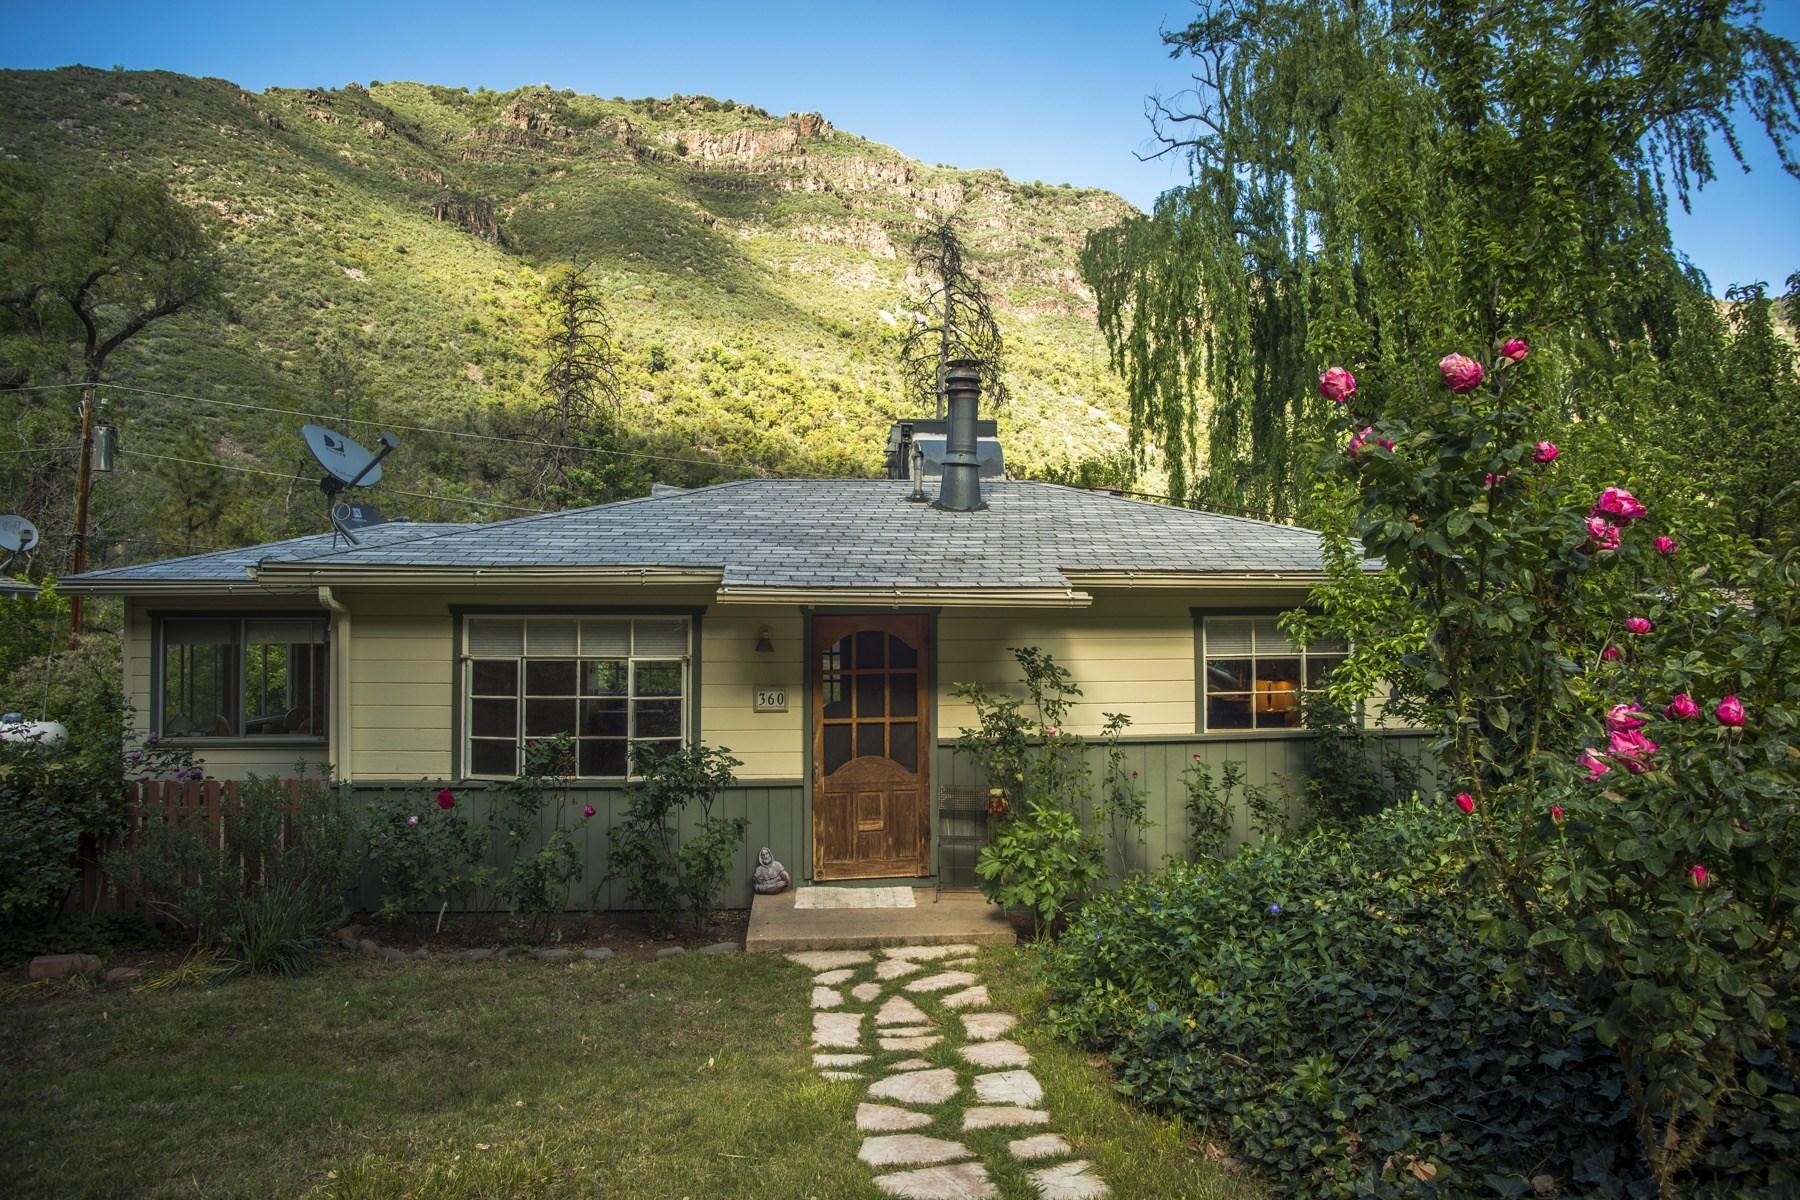 Einfamilienhaus für Verkauf beim Get-away in Sedona's famous Oak Creek Canyon 360 Staggs Loop Drive Sedona, Arizona 86336 Vereinigte Staaten